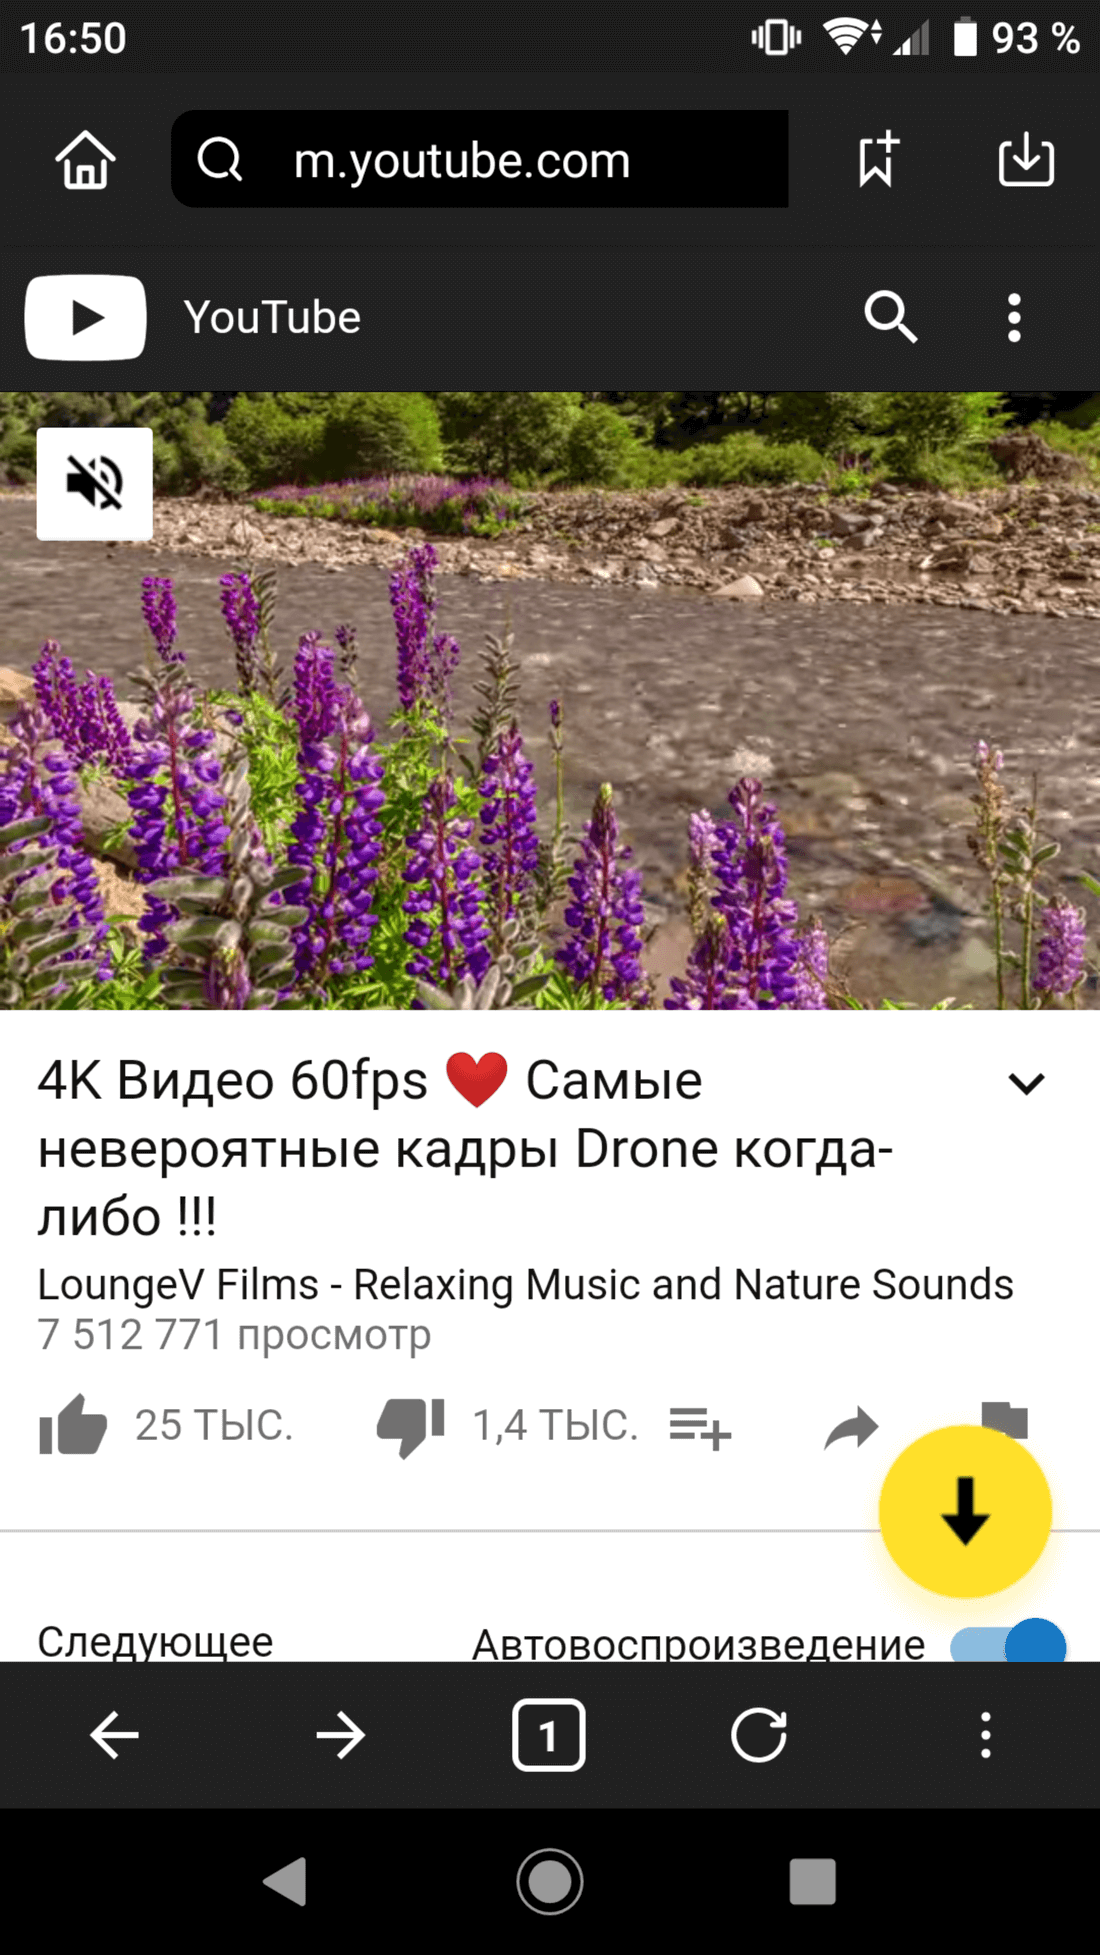 Скриншот #2 из программы SnapTube